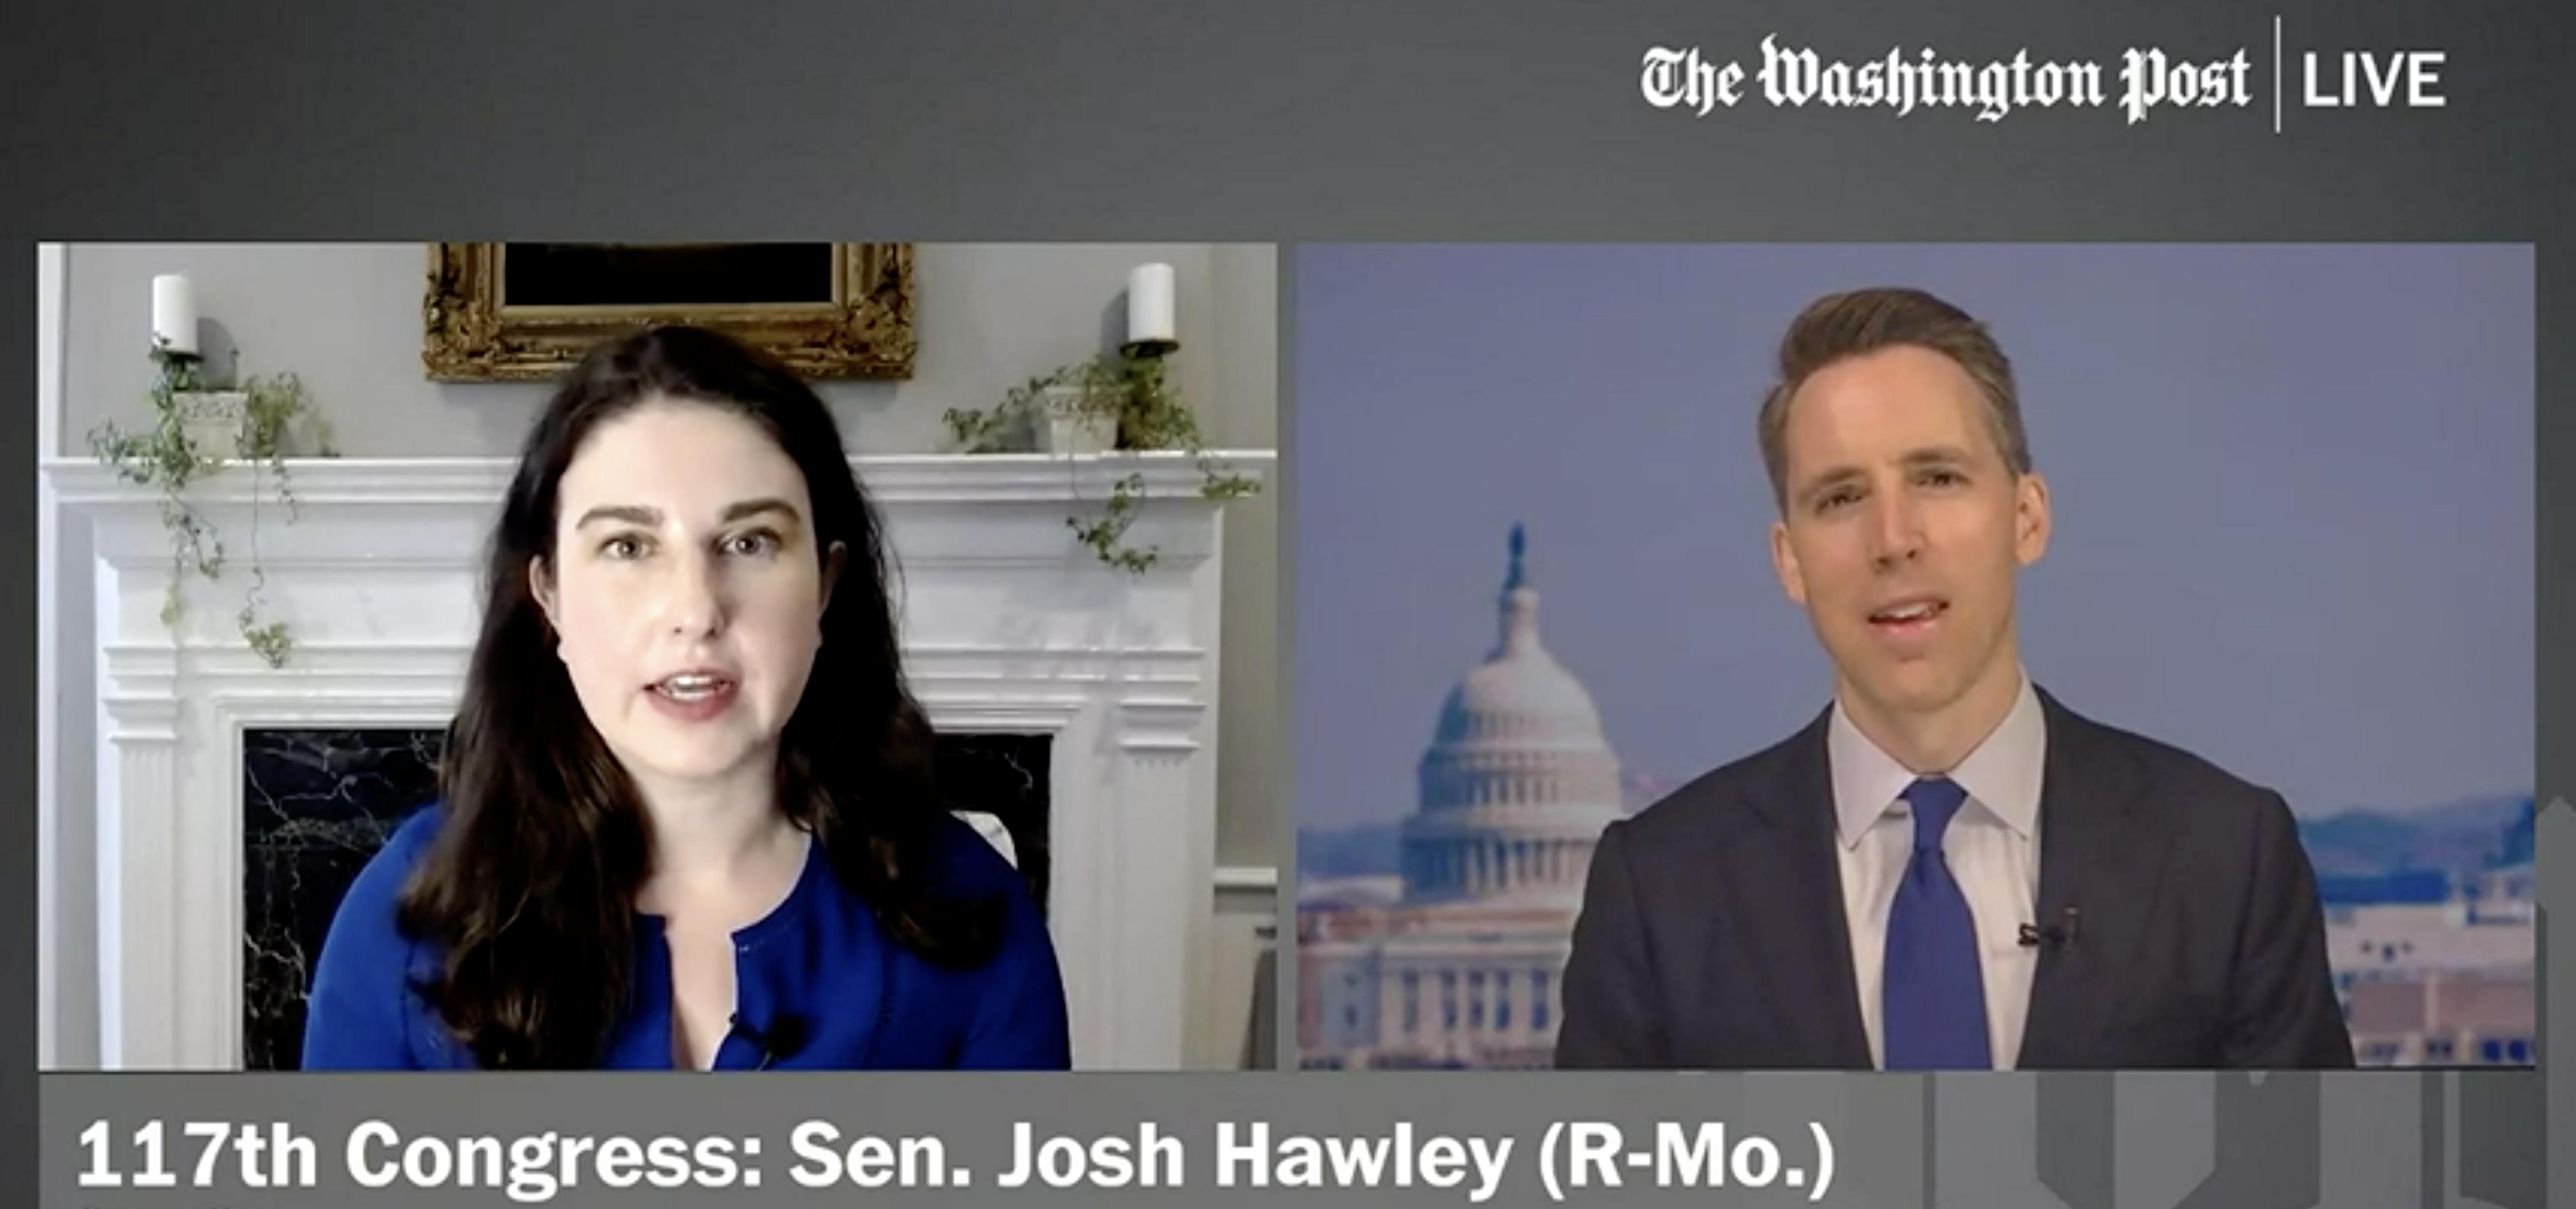 Washington Post technology policy reporter Cat Zakrzewski and Sen. Josh Hawley (R-Mo.) on Washington Post Live, May 4, 2021